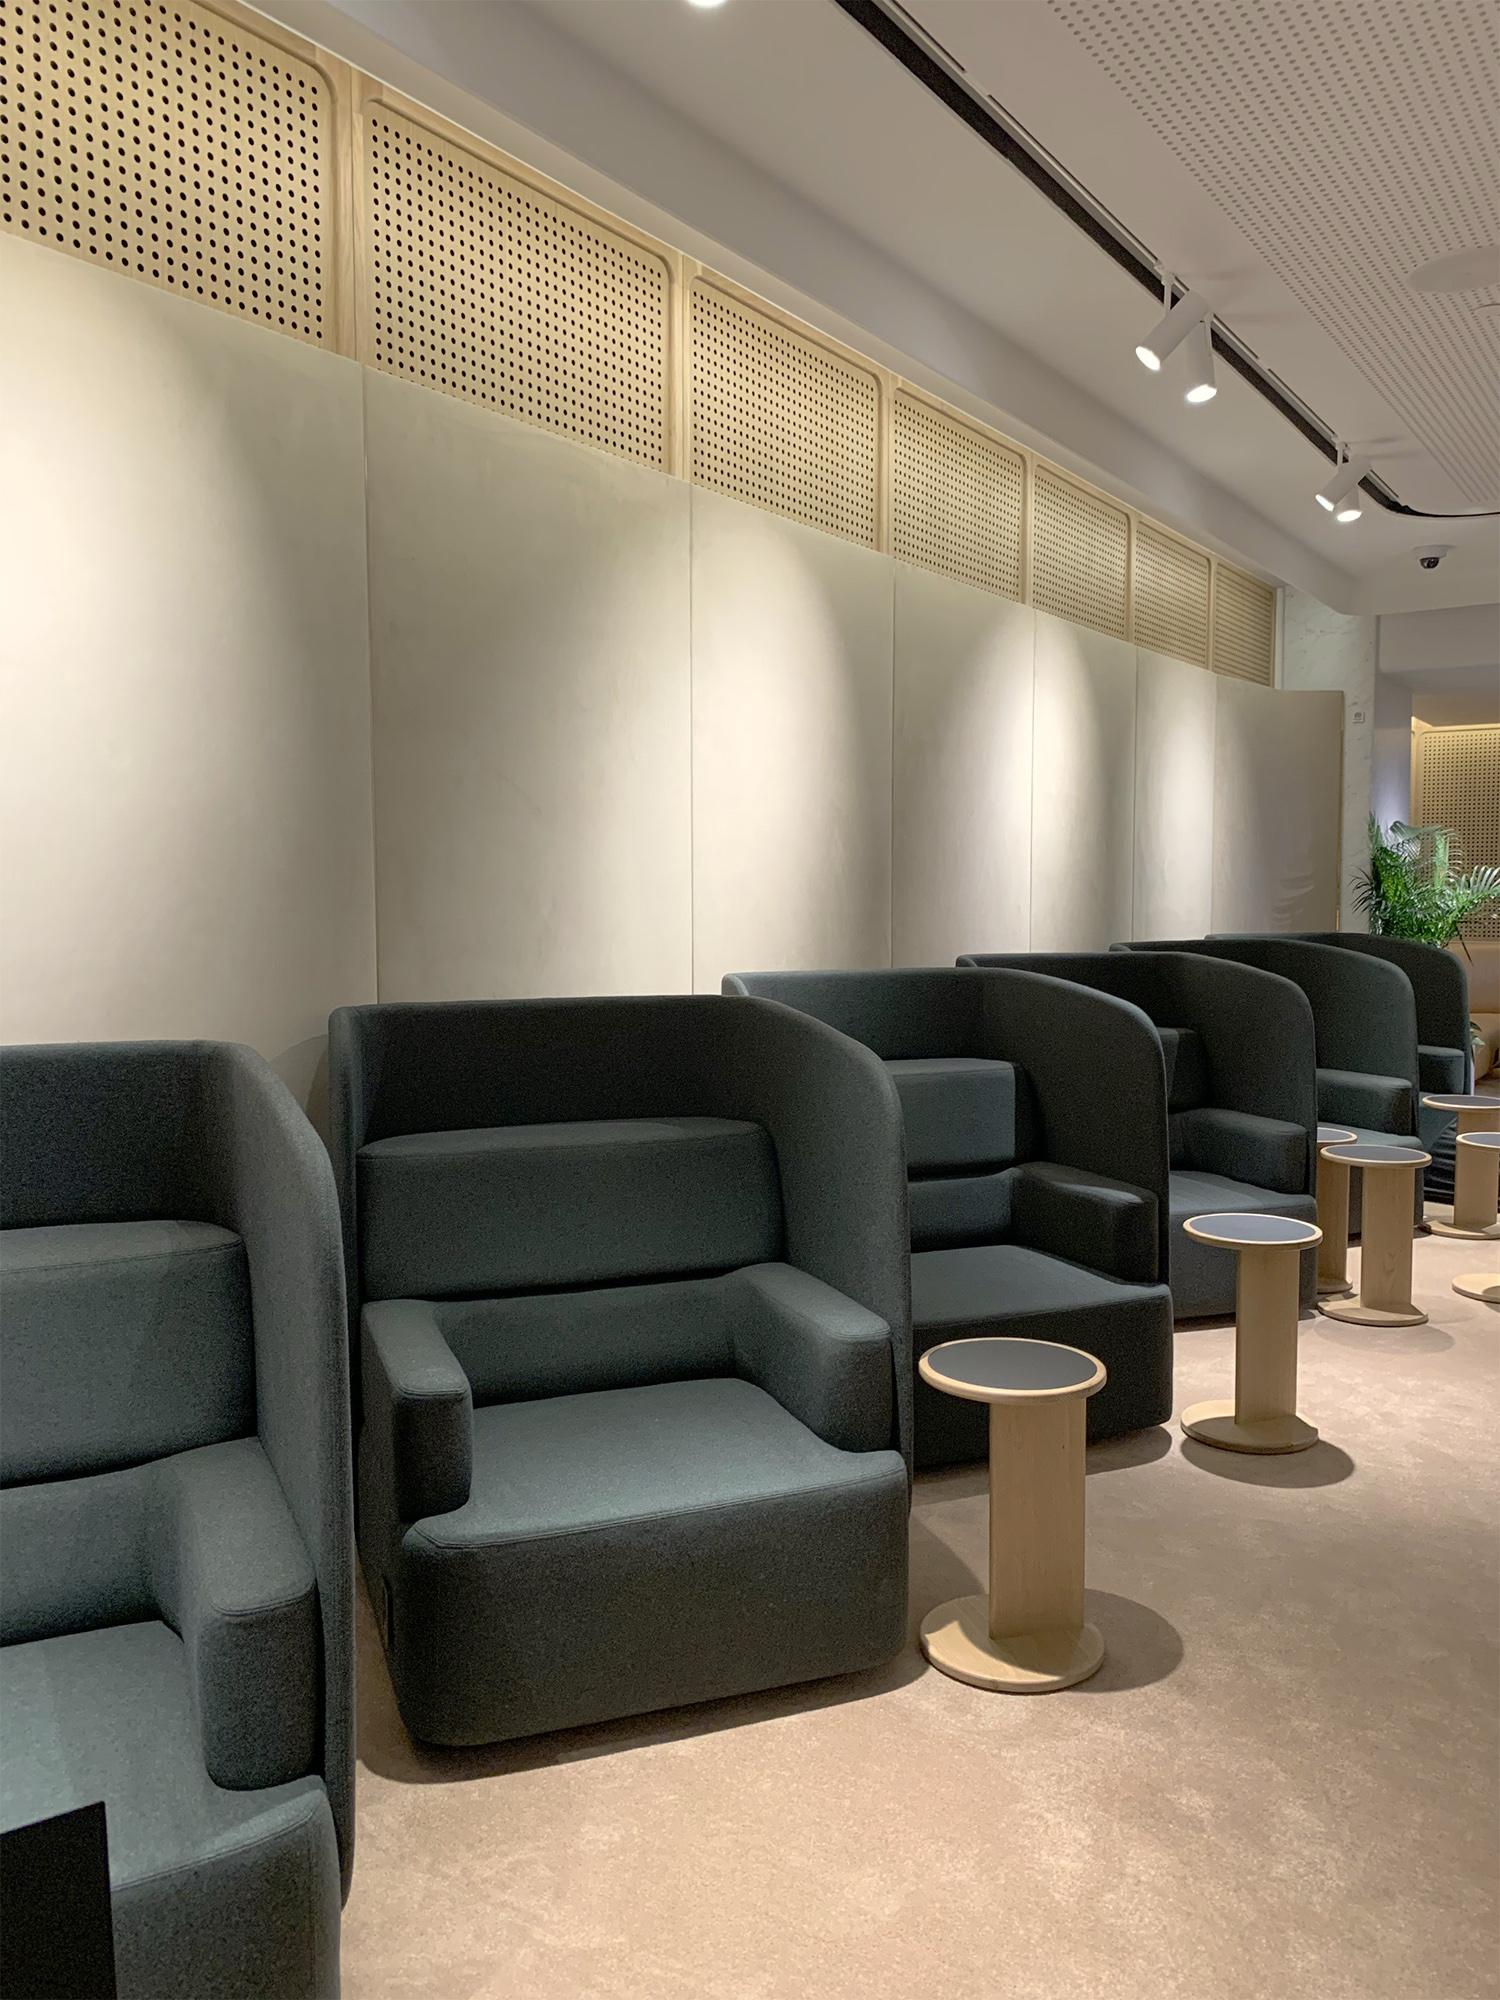 Solo Chairs.jpg